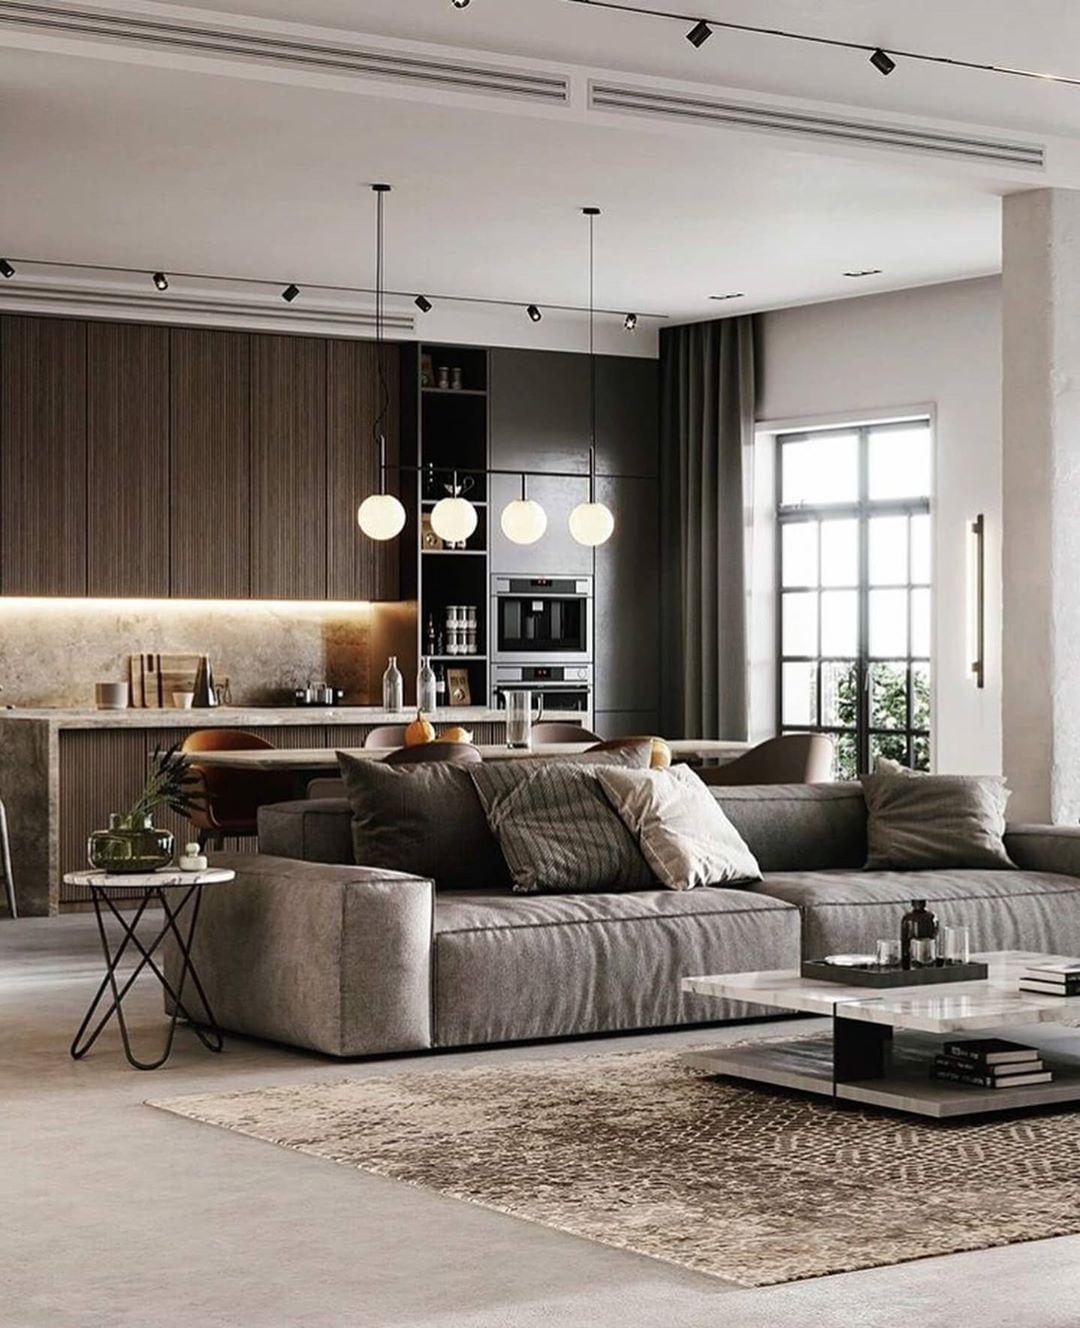 Luxurious Modern Houses On Instagram I Luxuriousmodernhouses The Best Interior Ex In 2020 Modern Minimalist Living Room Elegant Living Room Minimalist Living Room